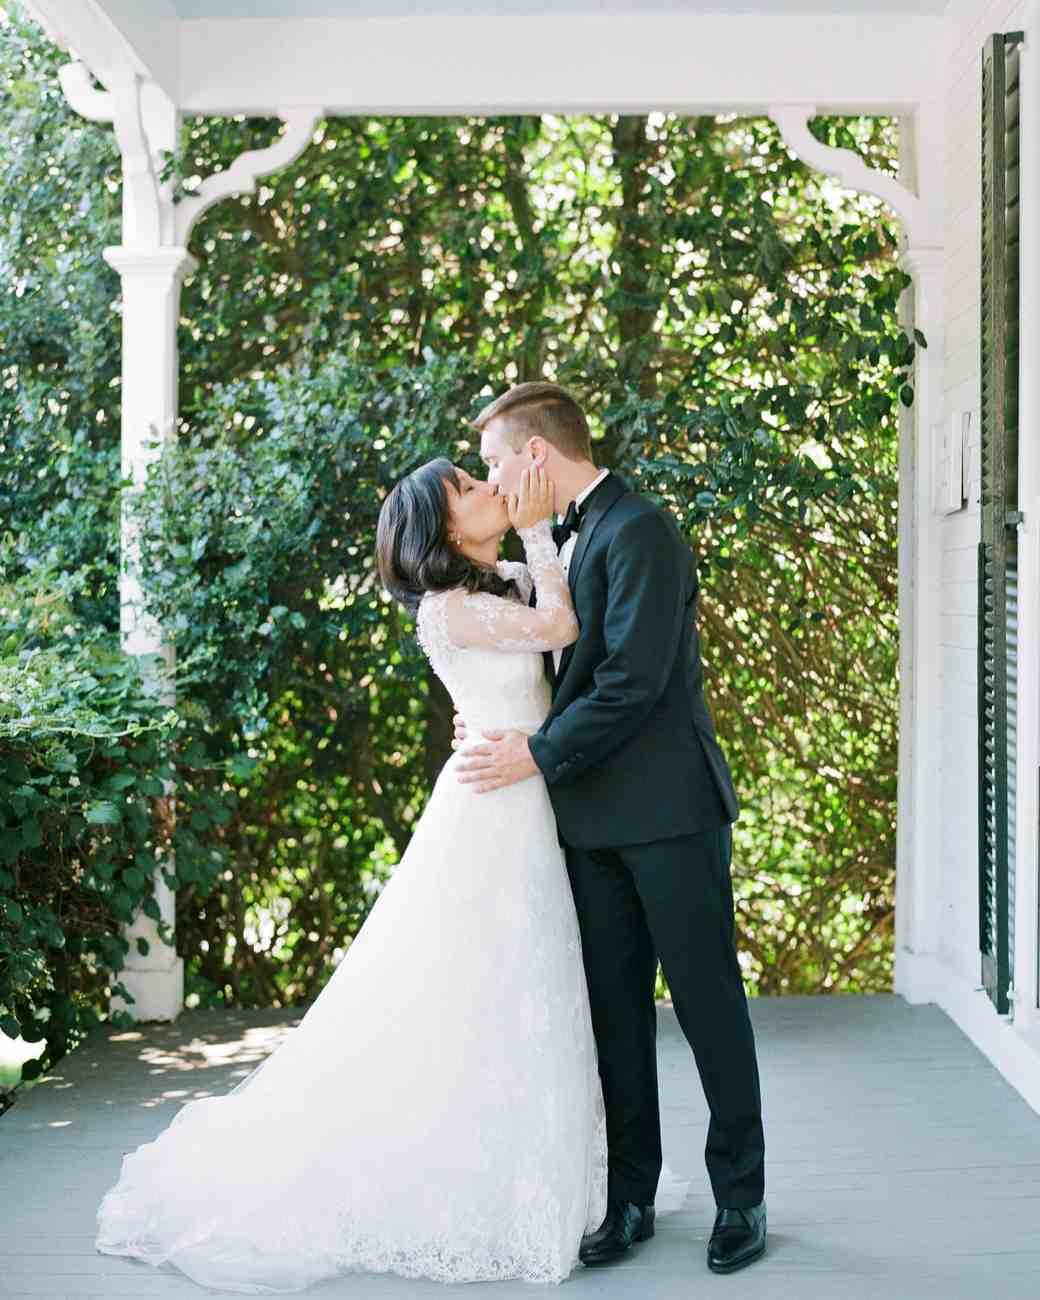 lissy-steven-wedding-newport-kiss-57-elizabethmessina-s112907-0516.jpg